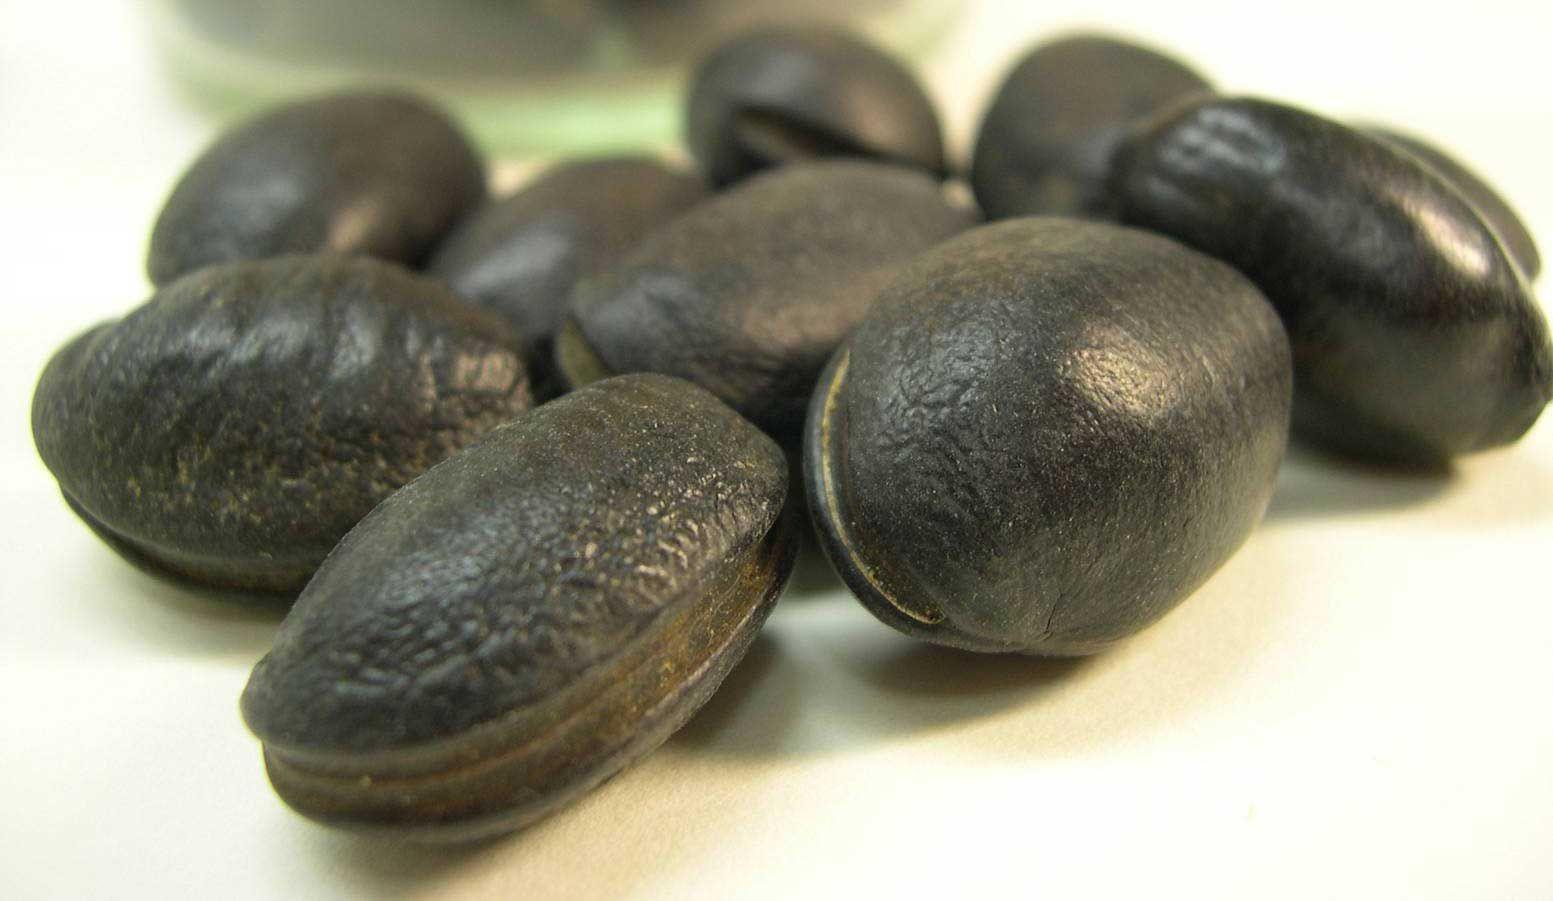 Calabar beans the cure climbing plants botanical